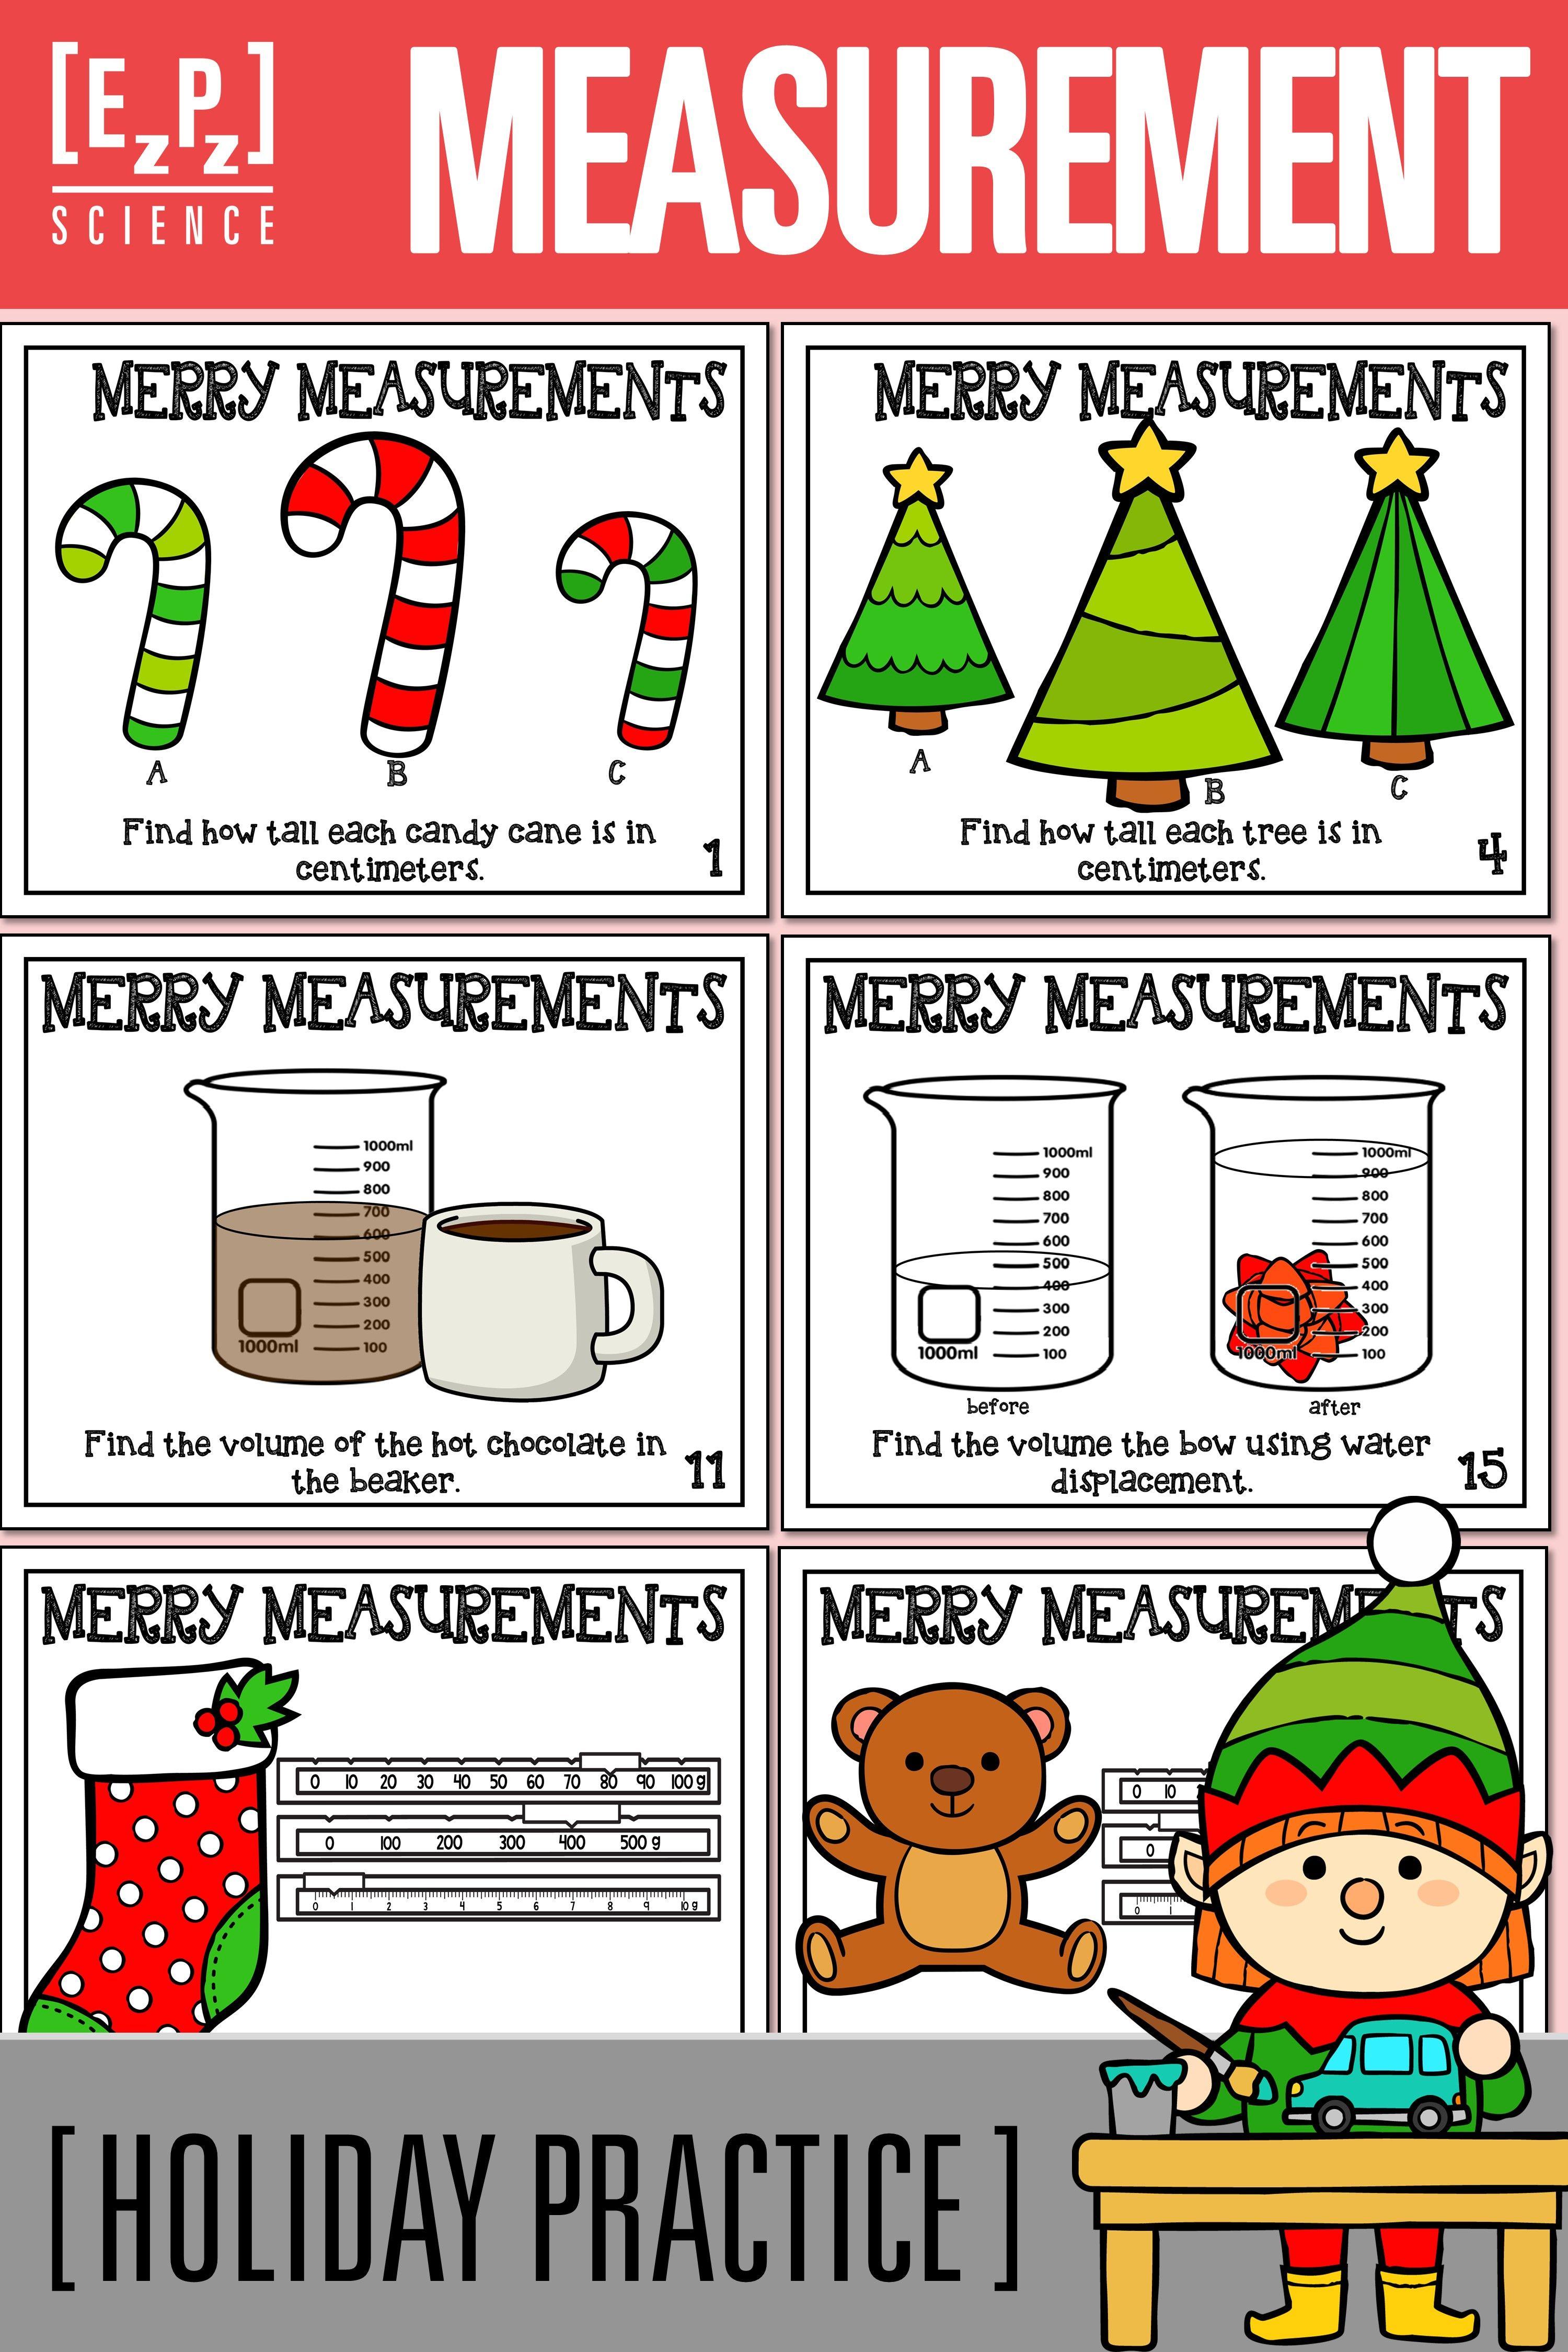 Scientific Measurements Merry Metric Measurements